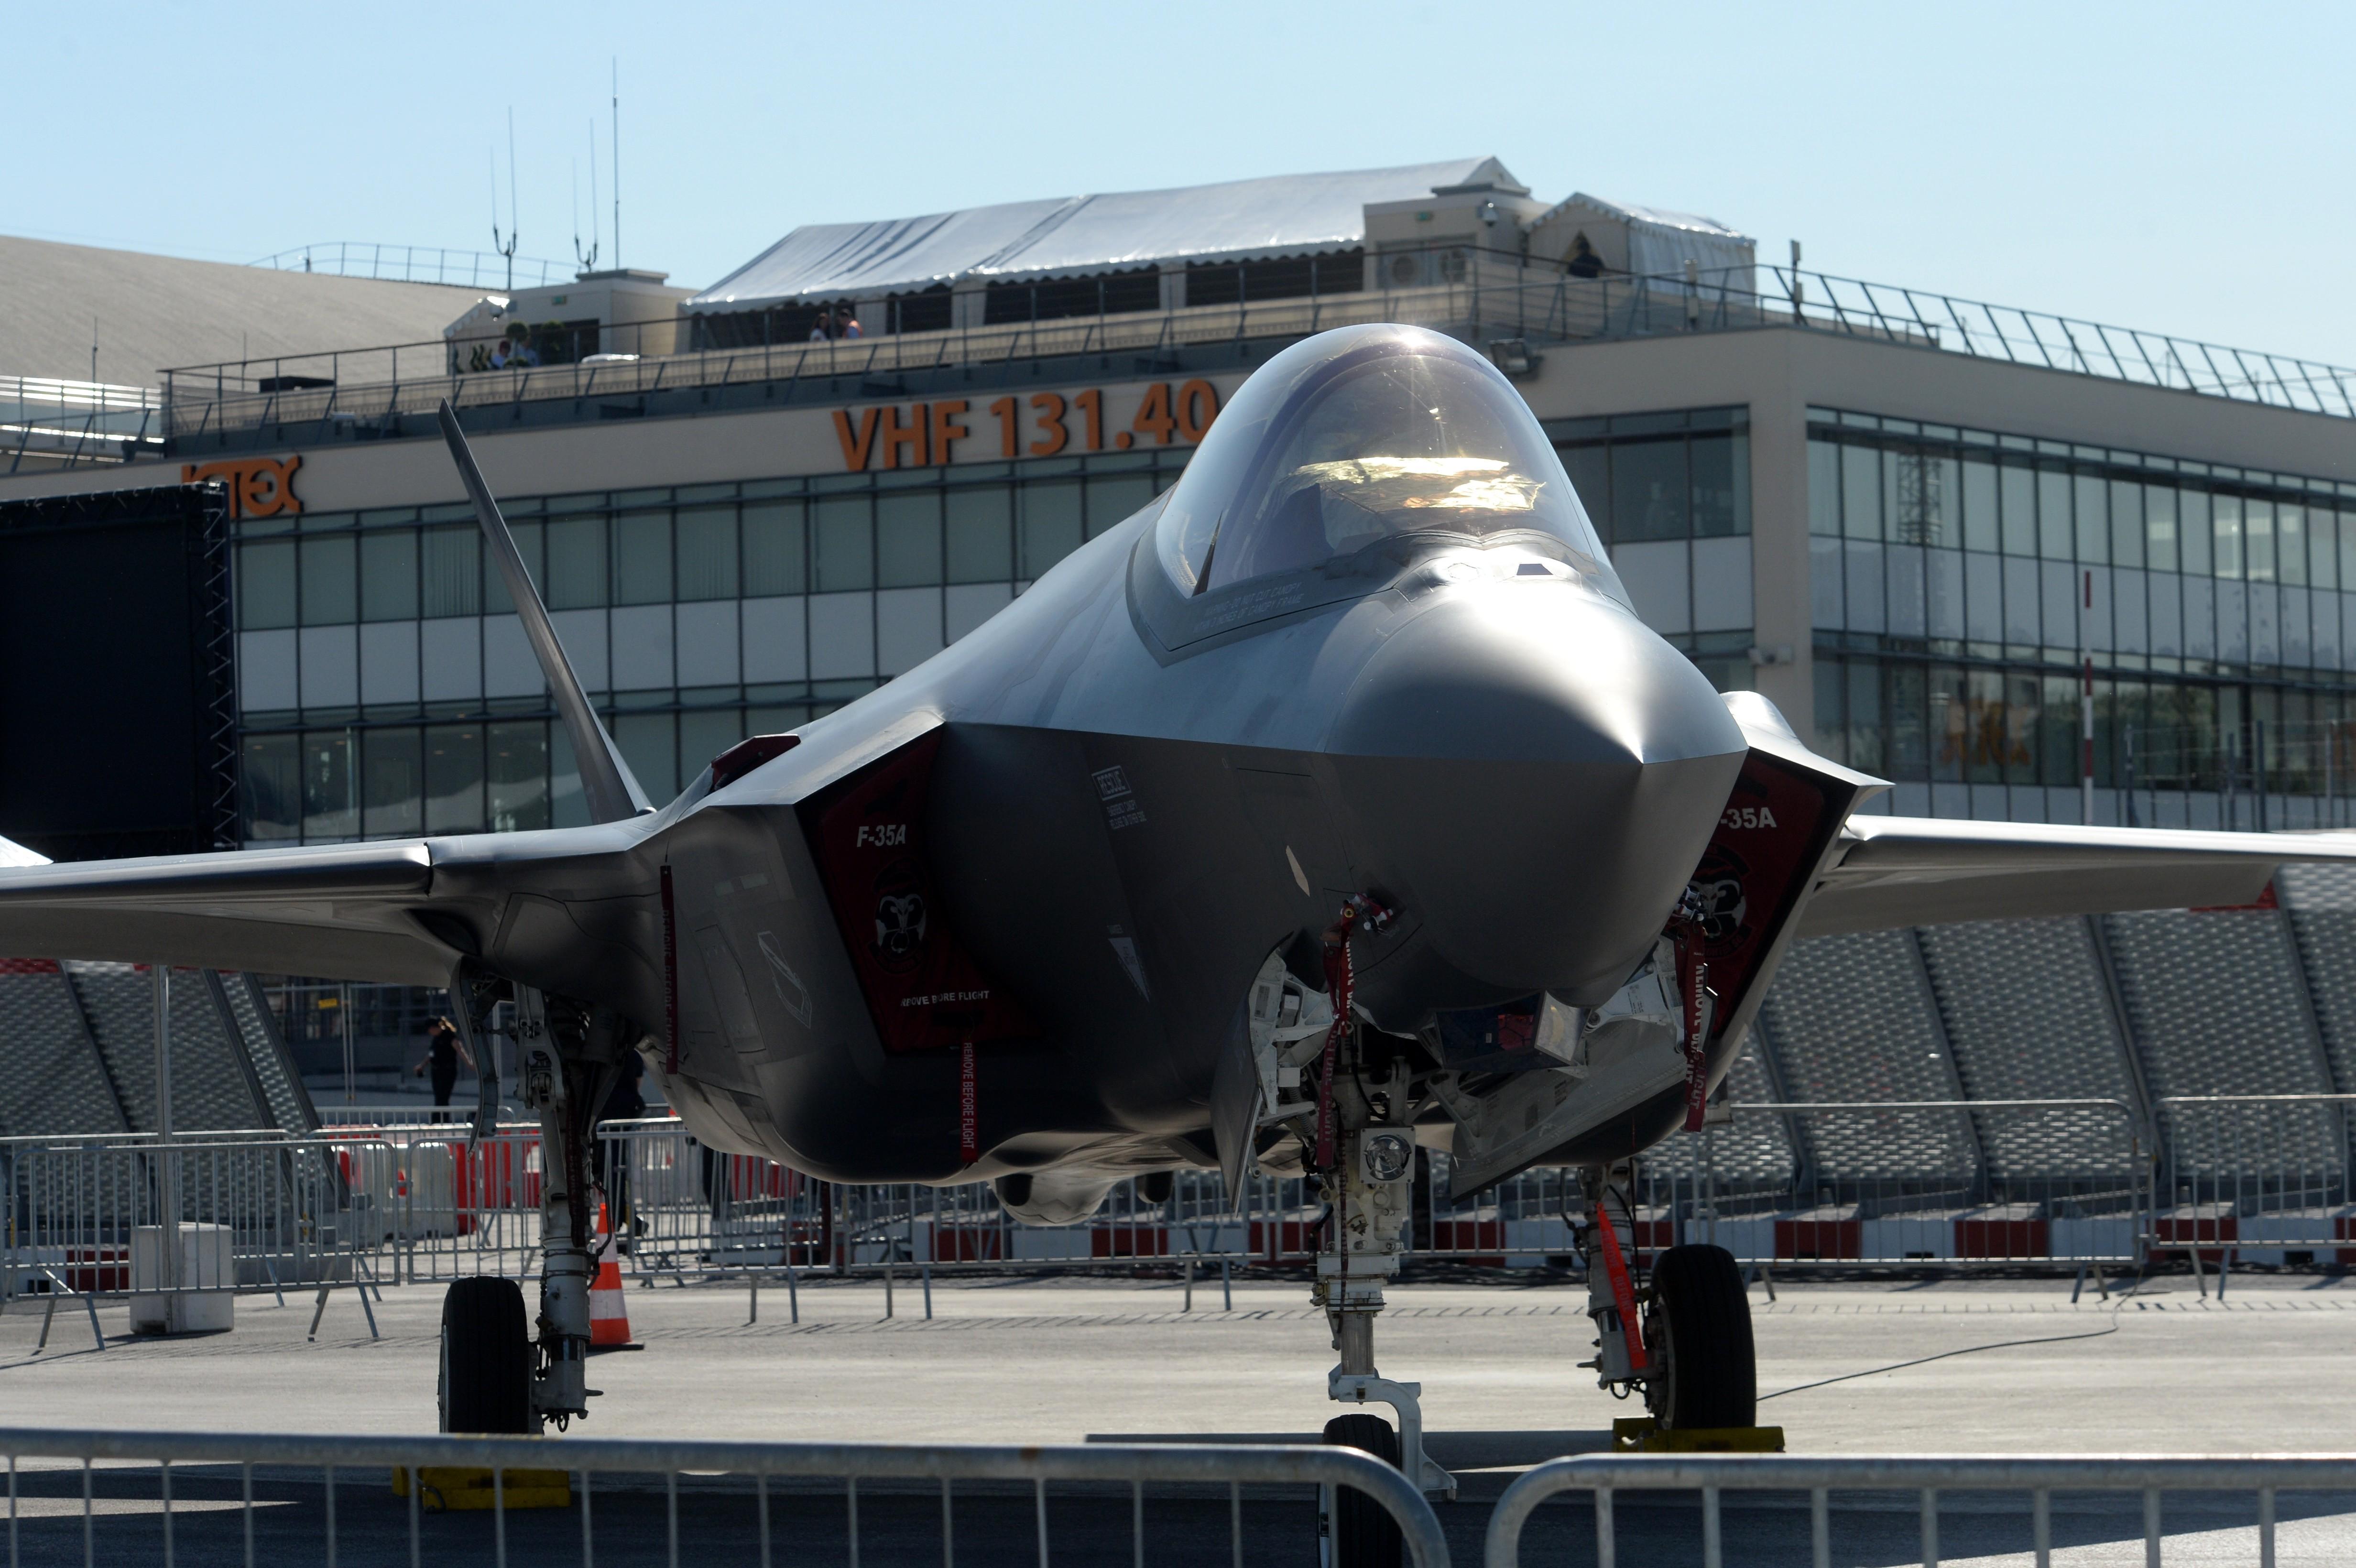 <p><span>Истребитель-бомбардировщик Lockheed Martin F-35 Lightning II.&nbsp;Фото &copy; РИА Новости/Сергей Мамонтов</span></p>